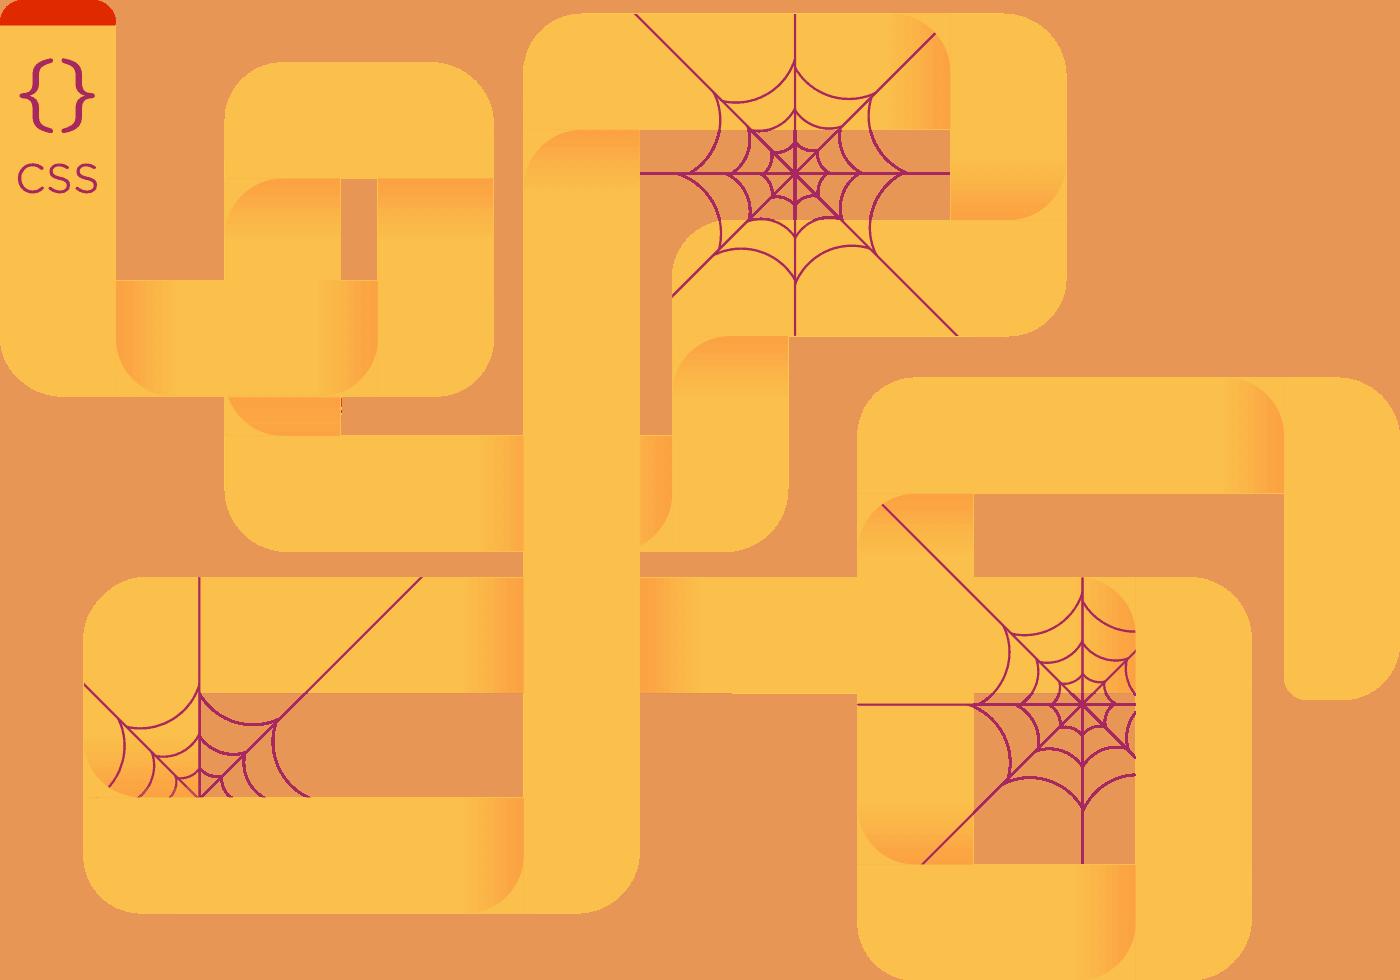 Tangled CSS